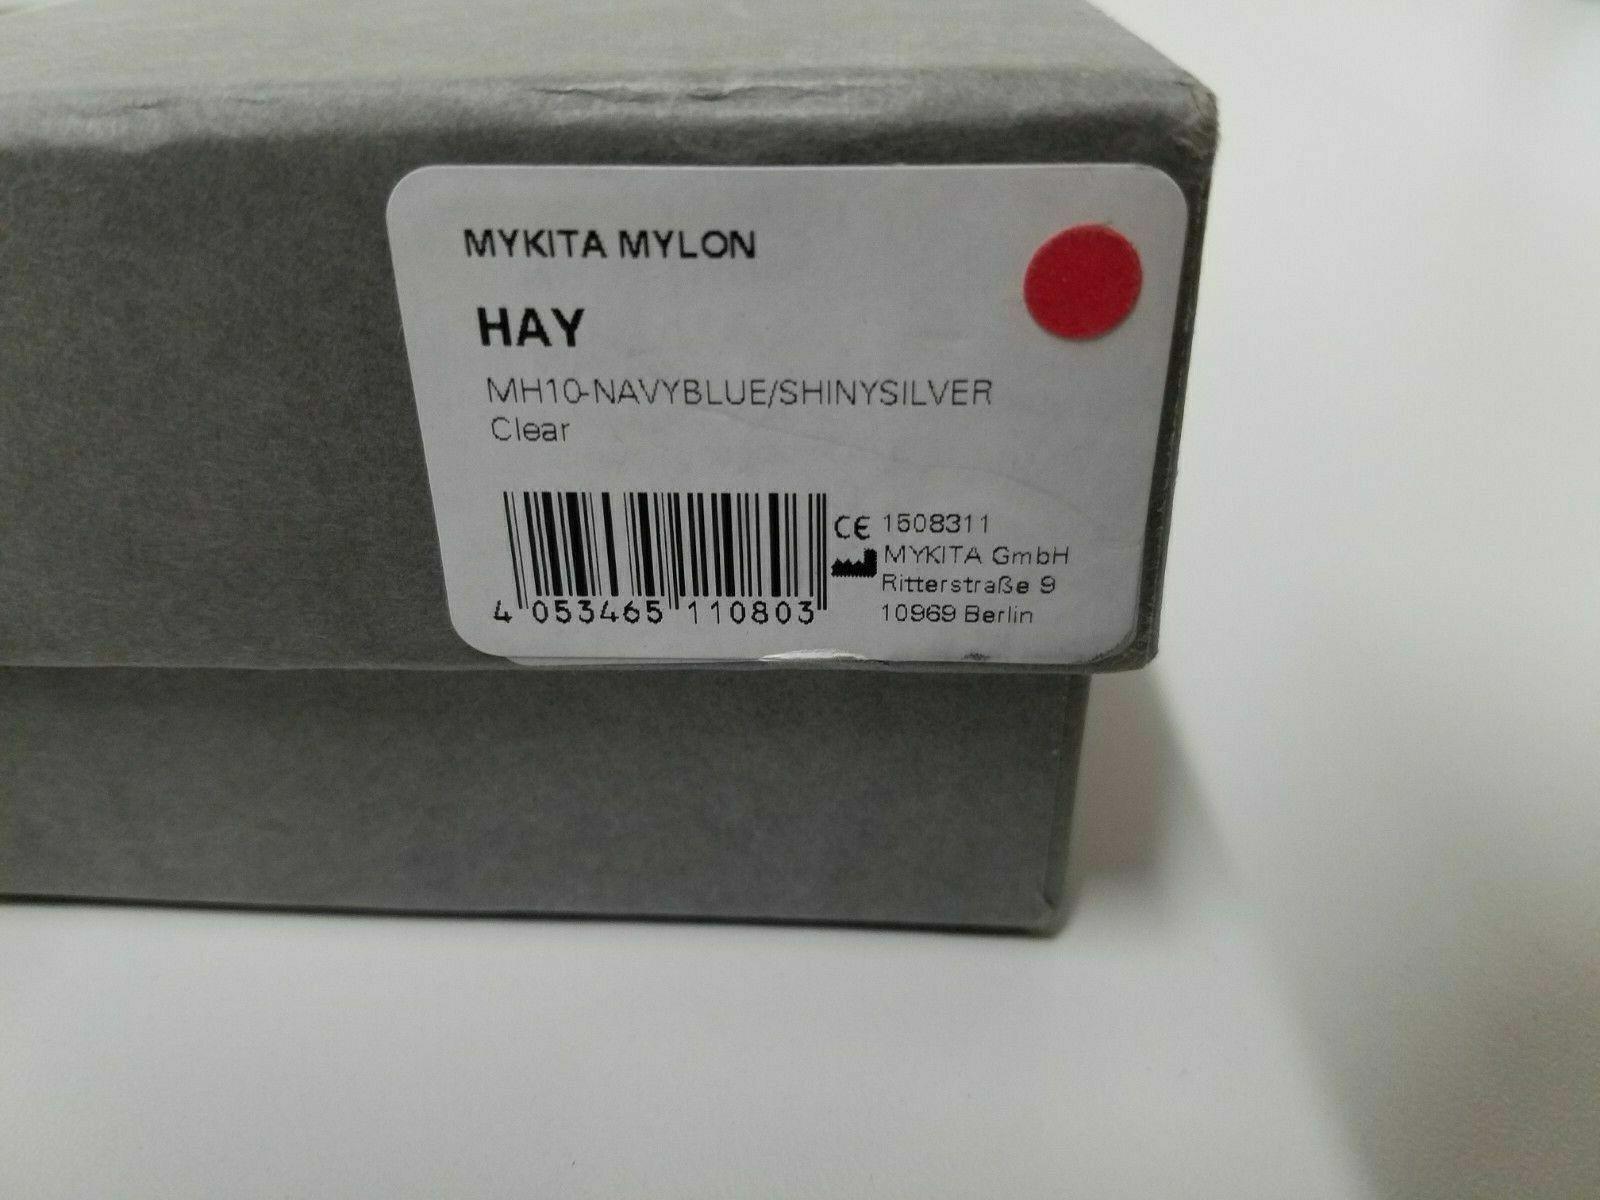 Mykita Mylon Hay - MH10 Navy BlueShinySilver Clear - Size 135 - Col 309